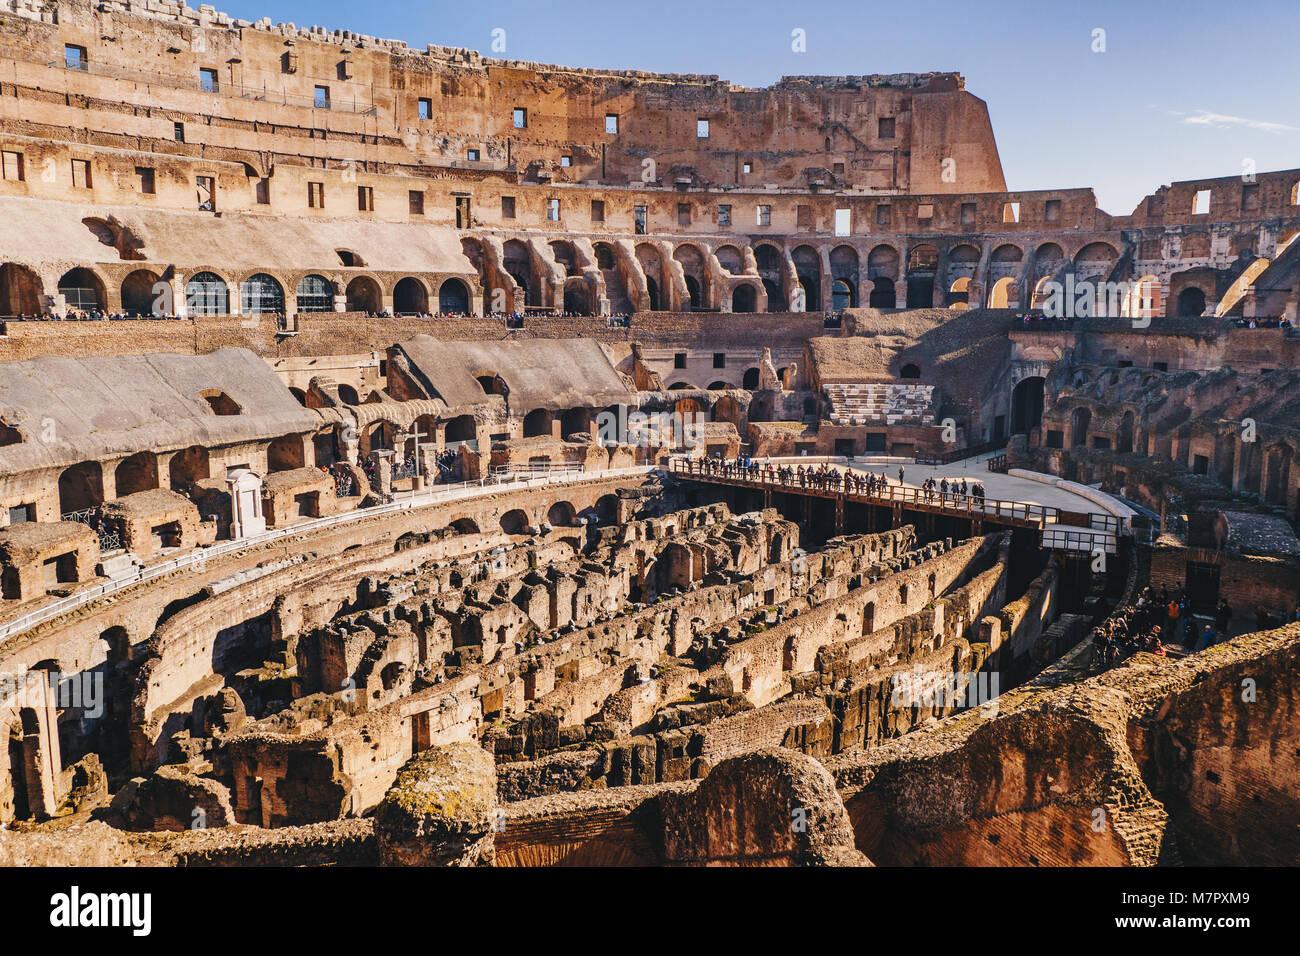 Colosseum interior, Rome, Italy - Stock Image